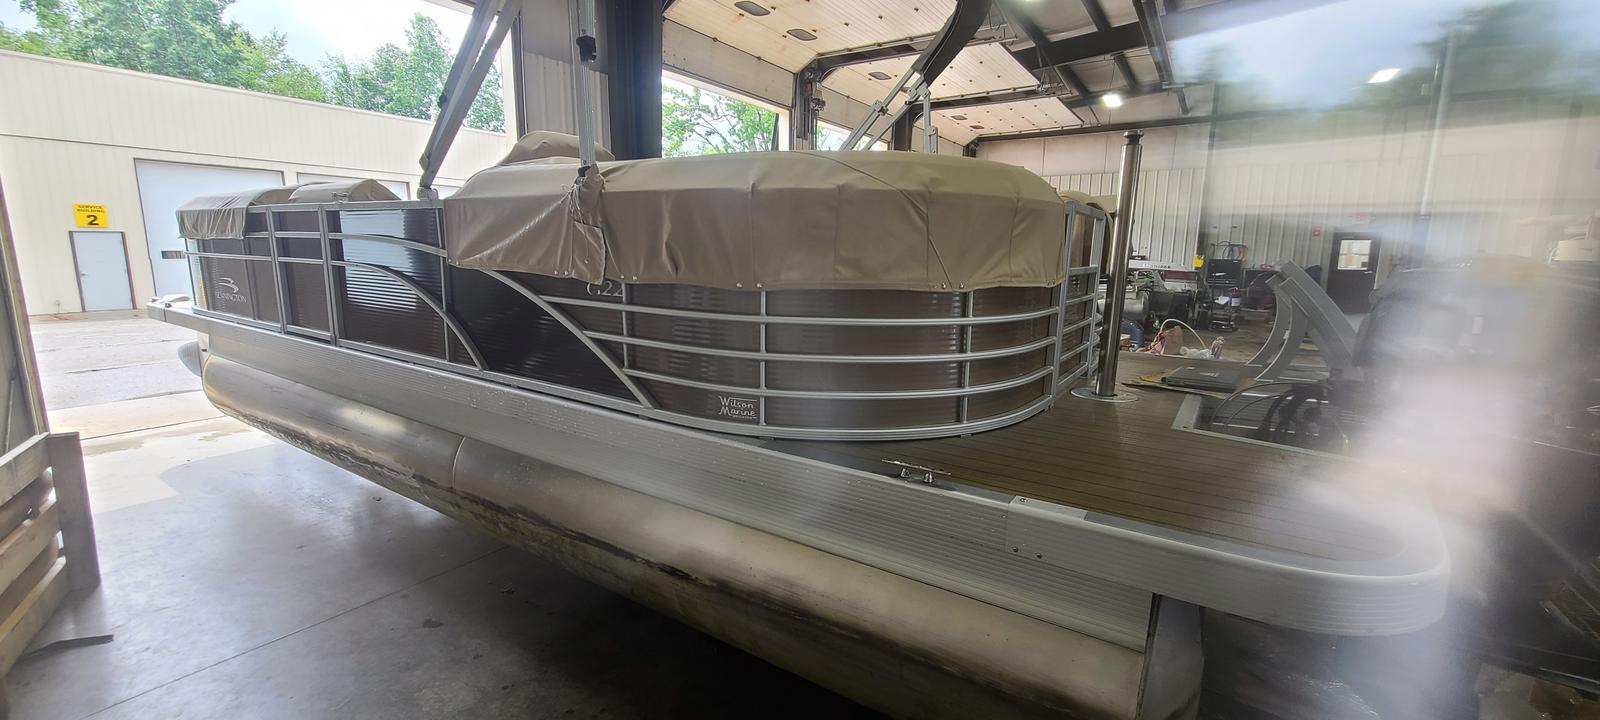 2018 Bennington boat for sale, model of the boat is 22 GSR & Image # 1 of 9